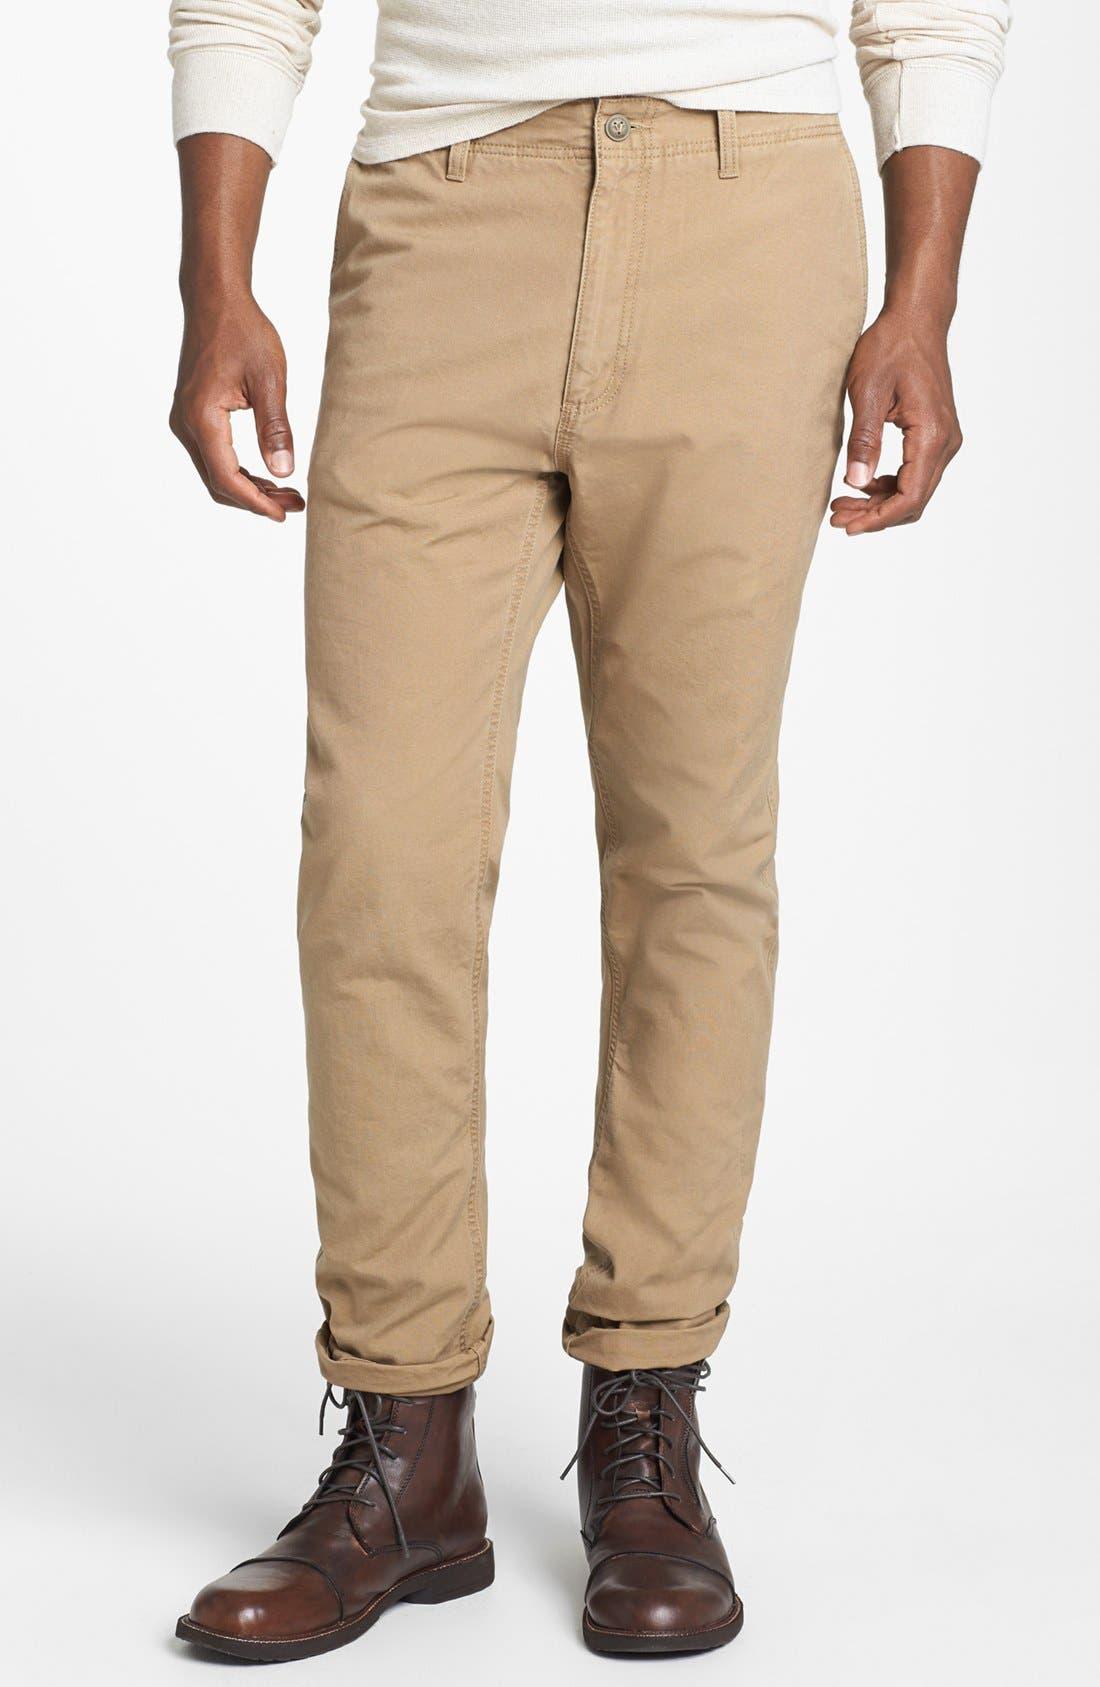 Alternate Image 1 Selected - Vans 'Cali Carpenter' Slim Fit Canvas Pants